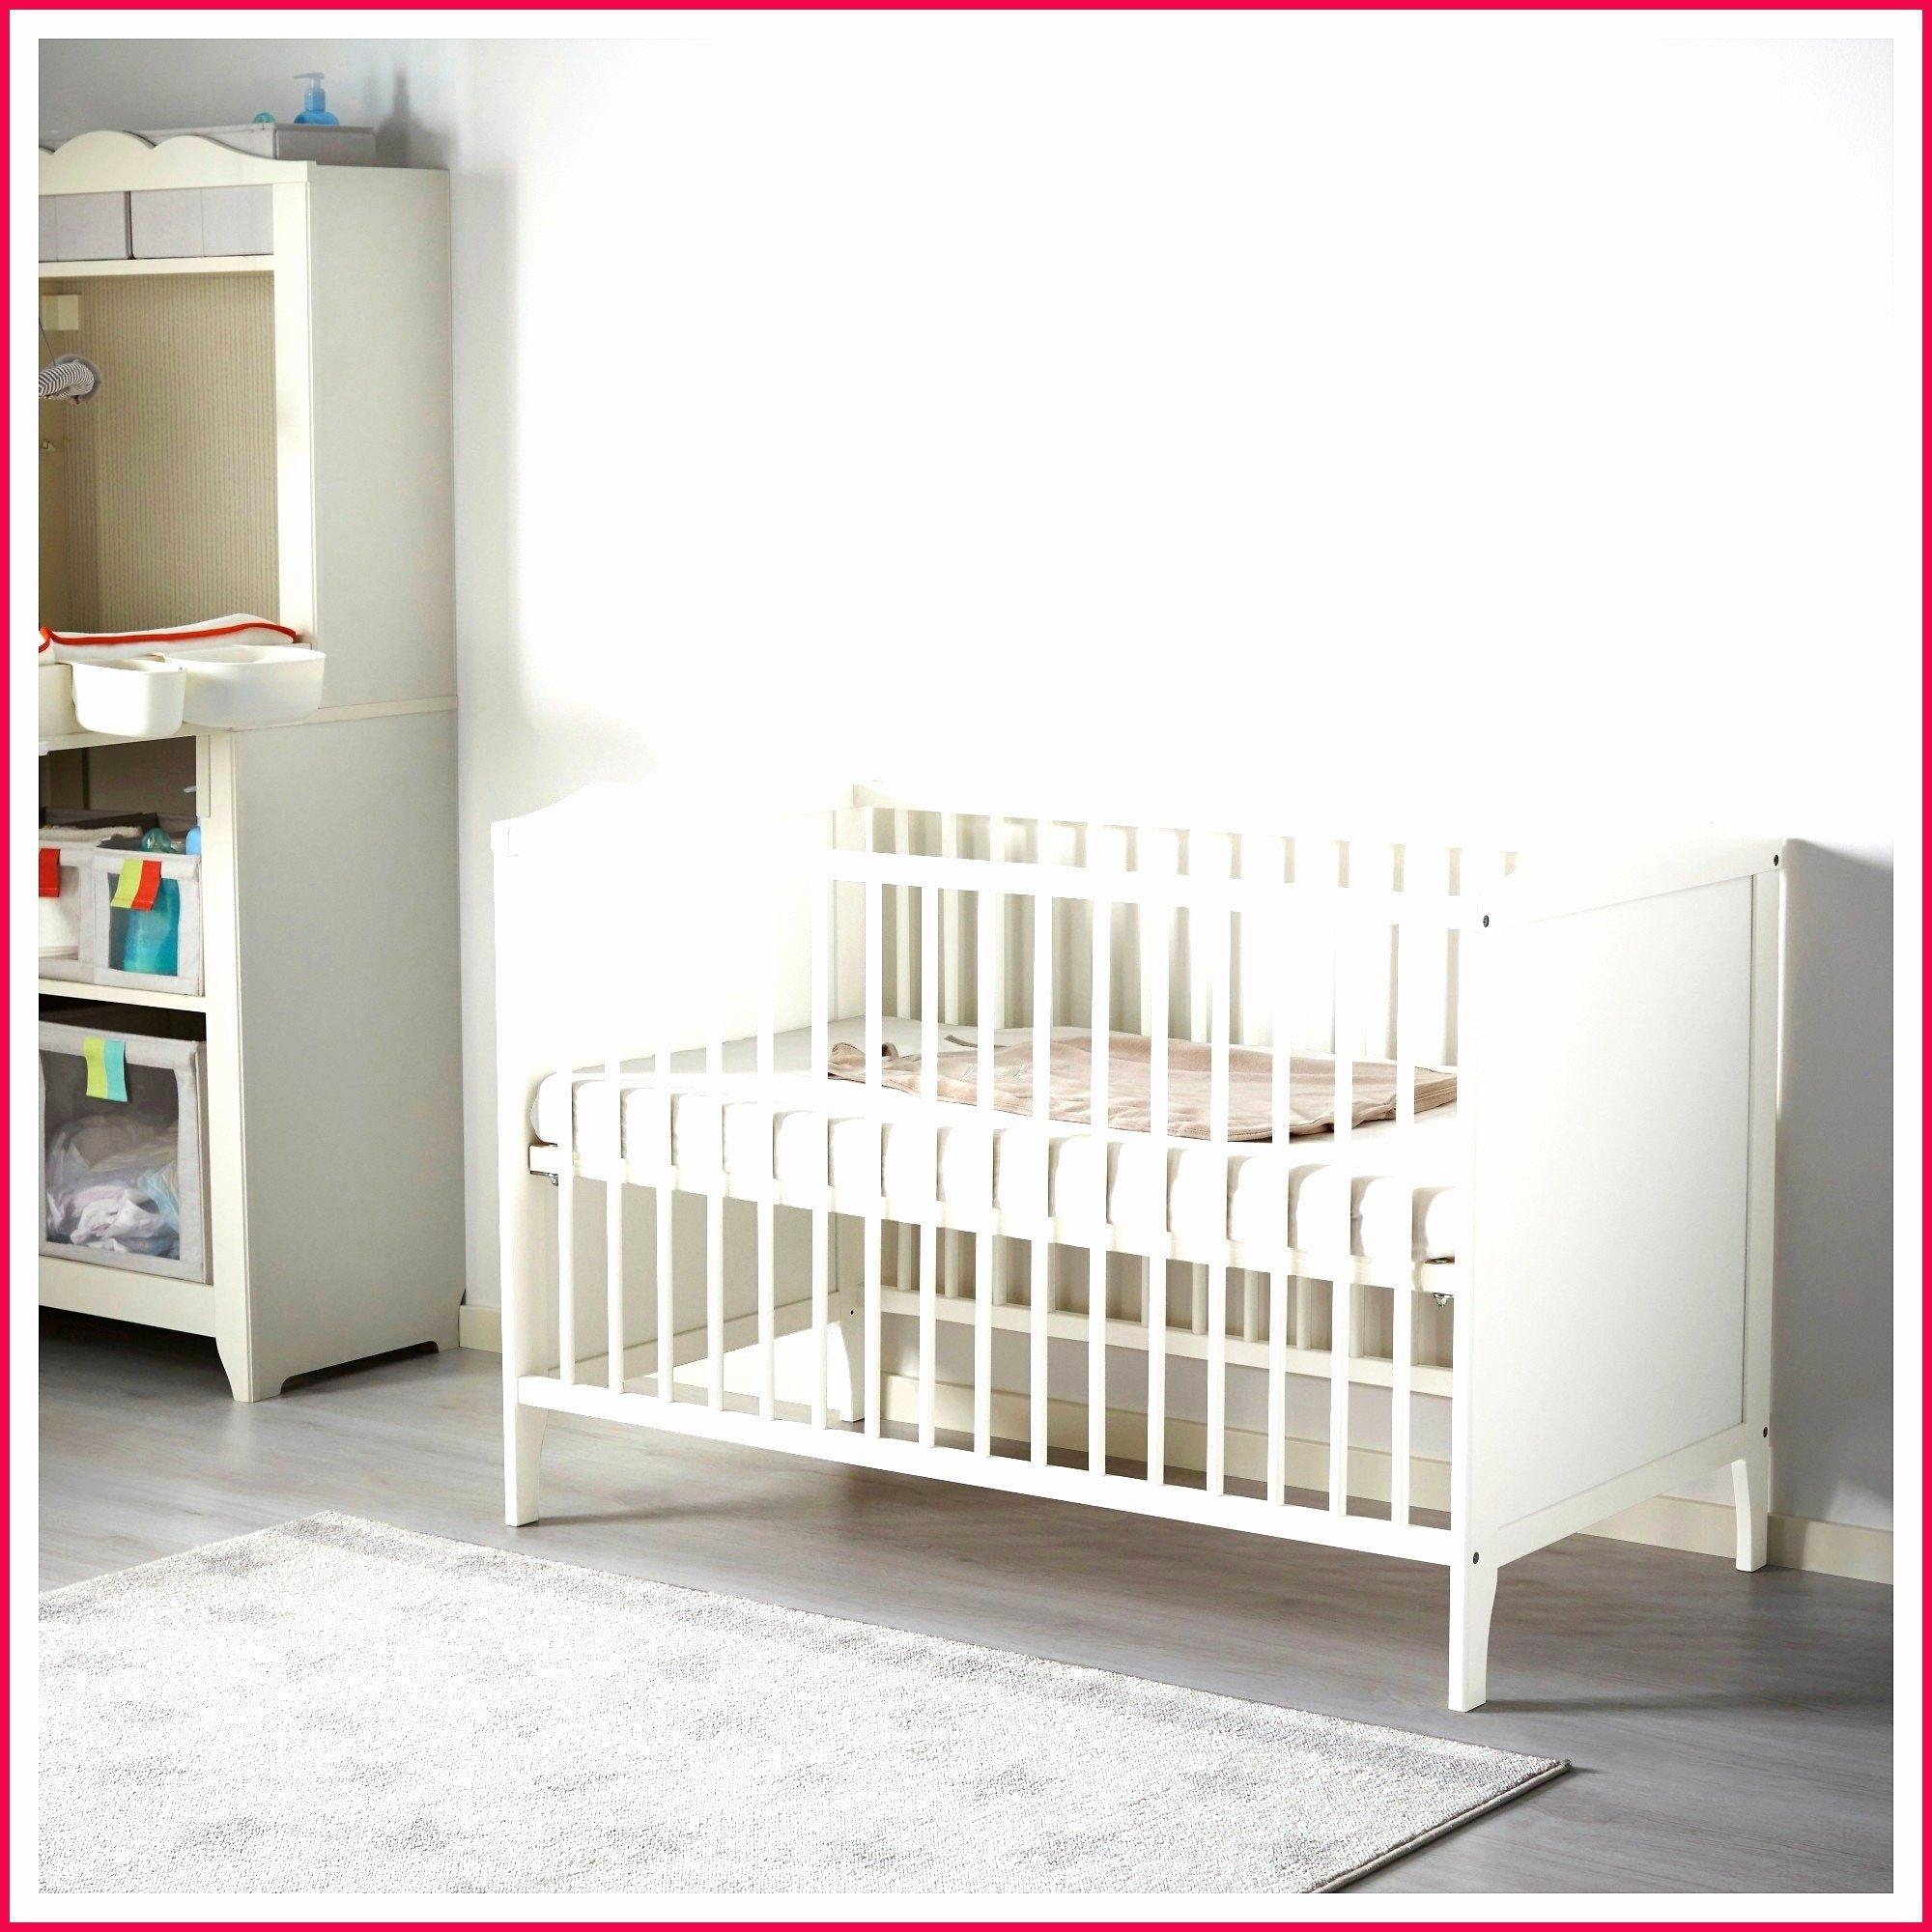 Baignoire Pliante Bébé Beautiful Lit Bebe Luxe 36 Ikea Best De Avec